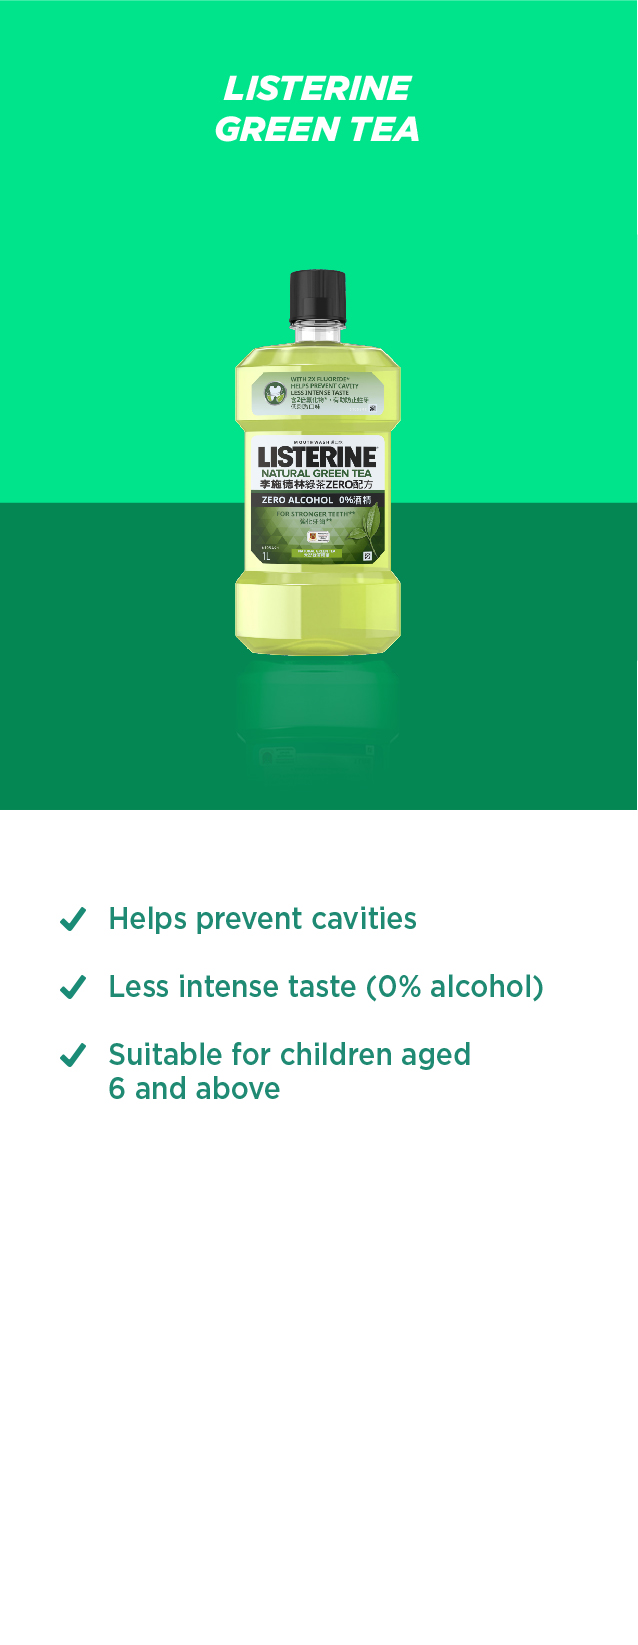 listerine-green-tea-summary-tout.jpg